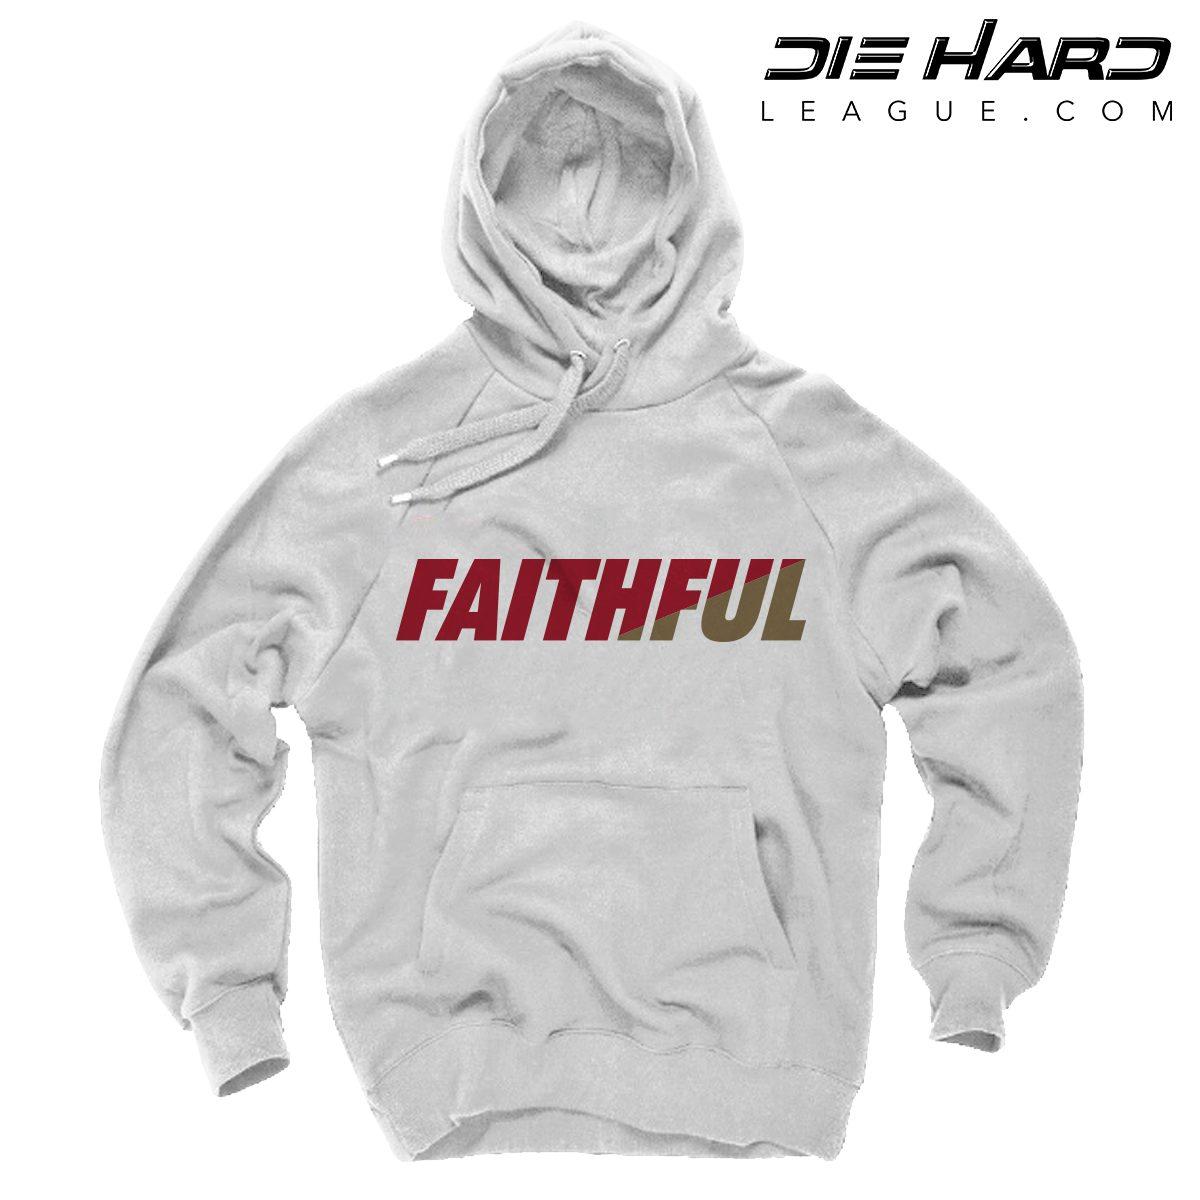 49ers Mens Hoodie - San Francisco 49ers FAITHFUL White Hoodie 89ac108f6